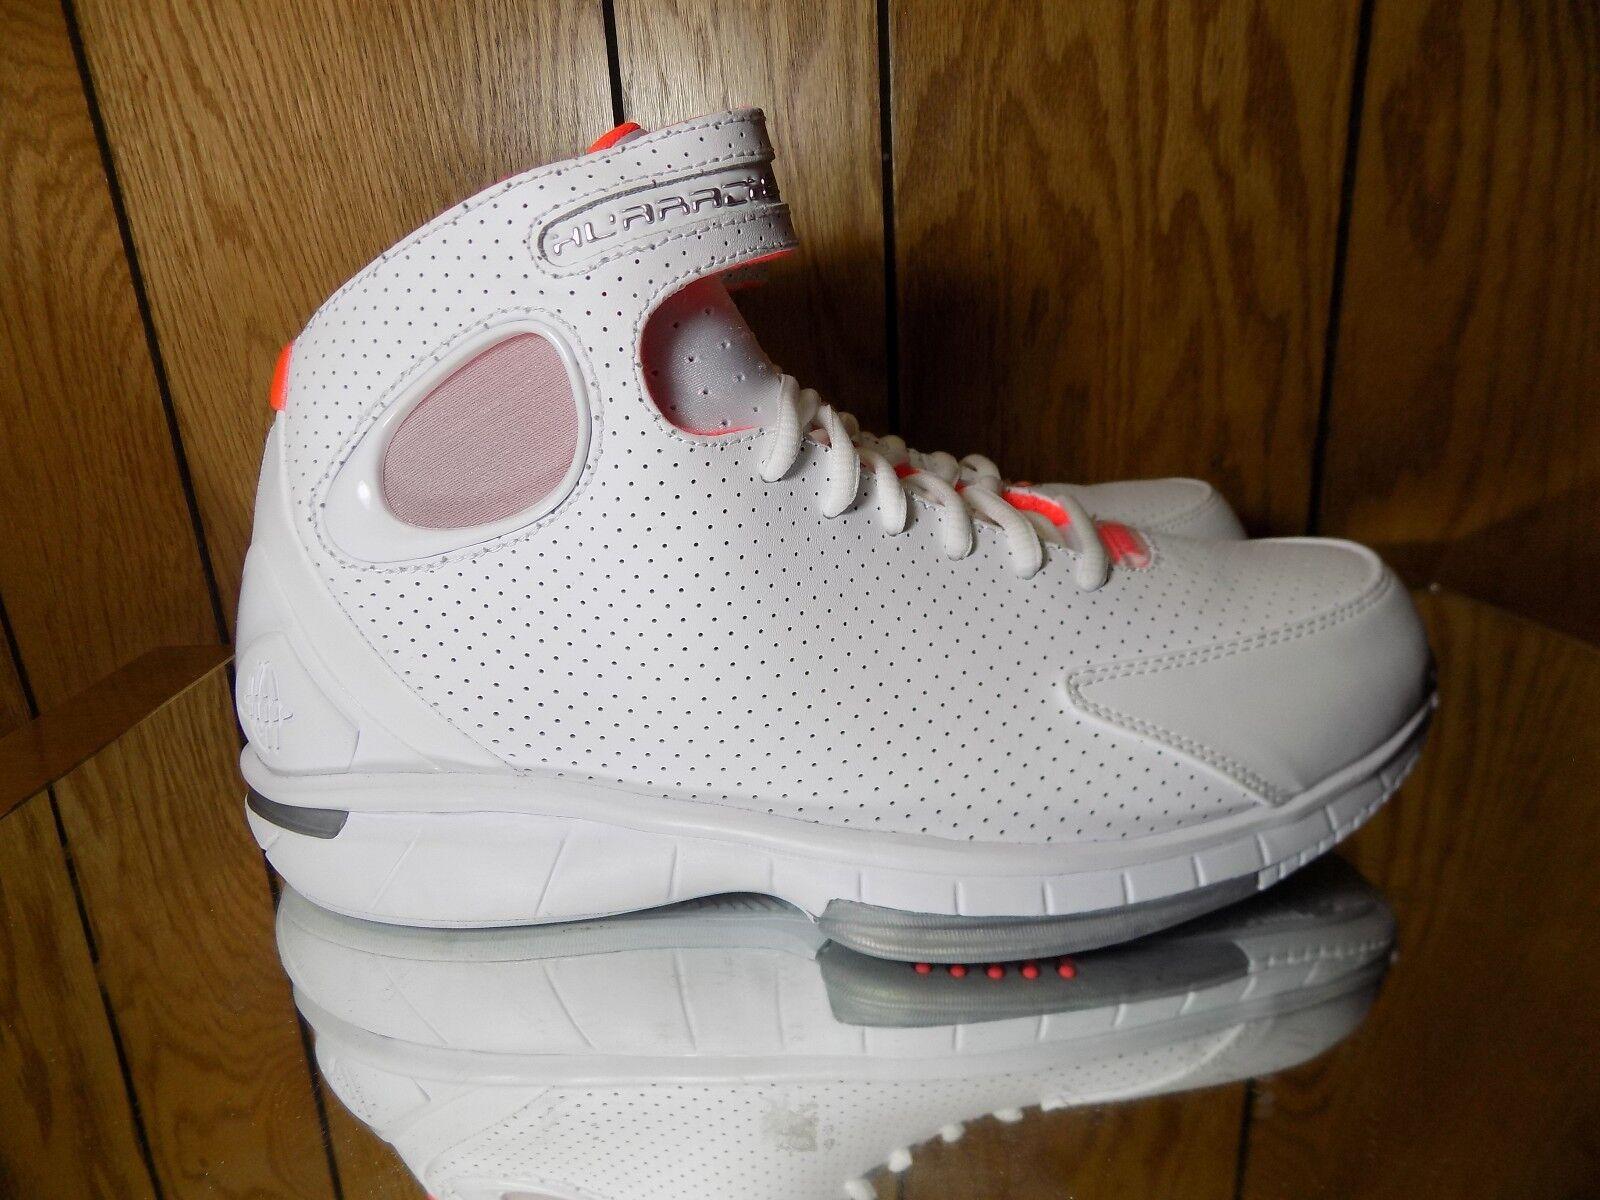 Nike Men Air Zoom Huarache 2k4 Shoes 308475 102 White Lava Red s. 9.5